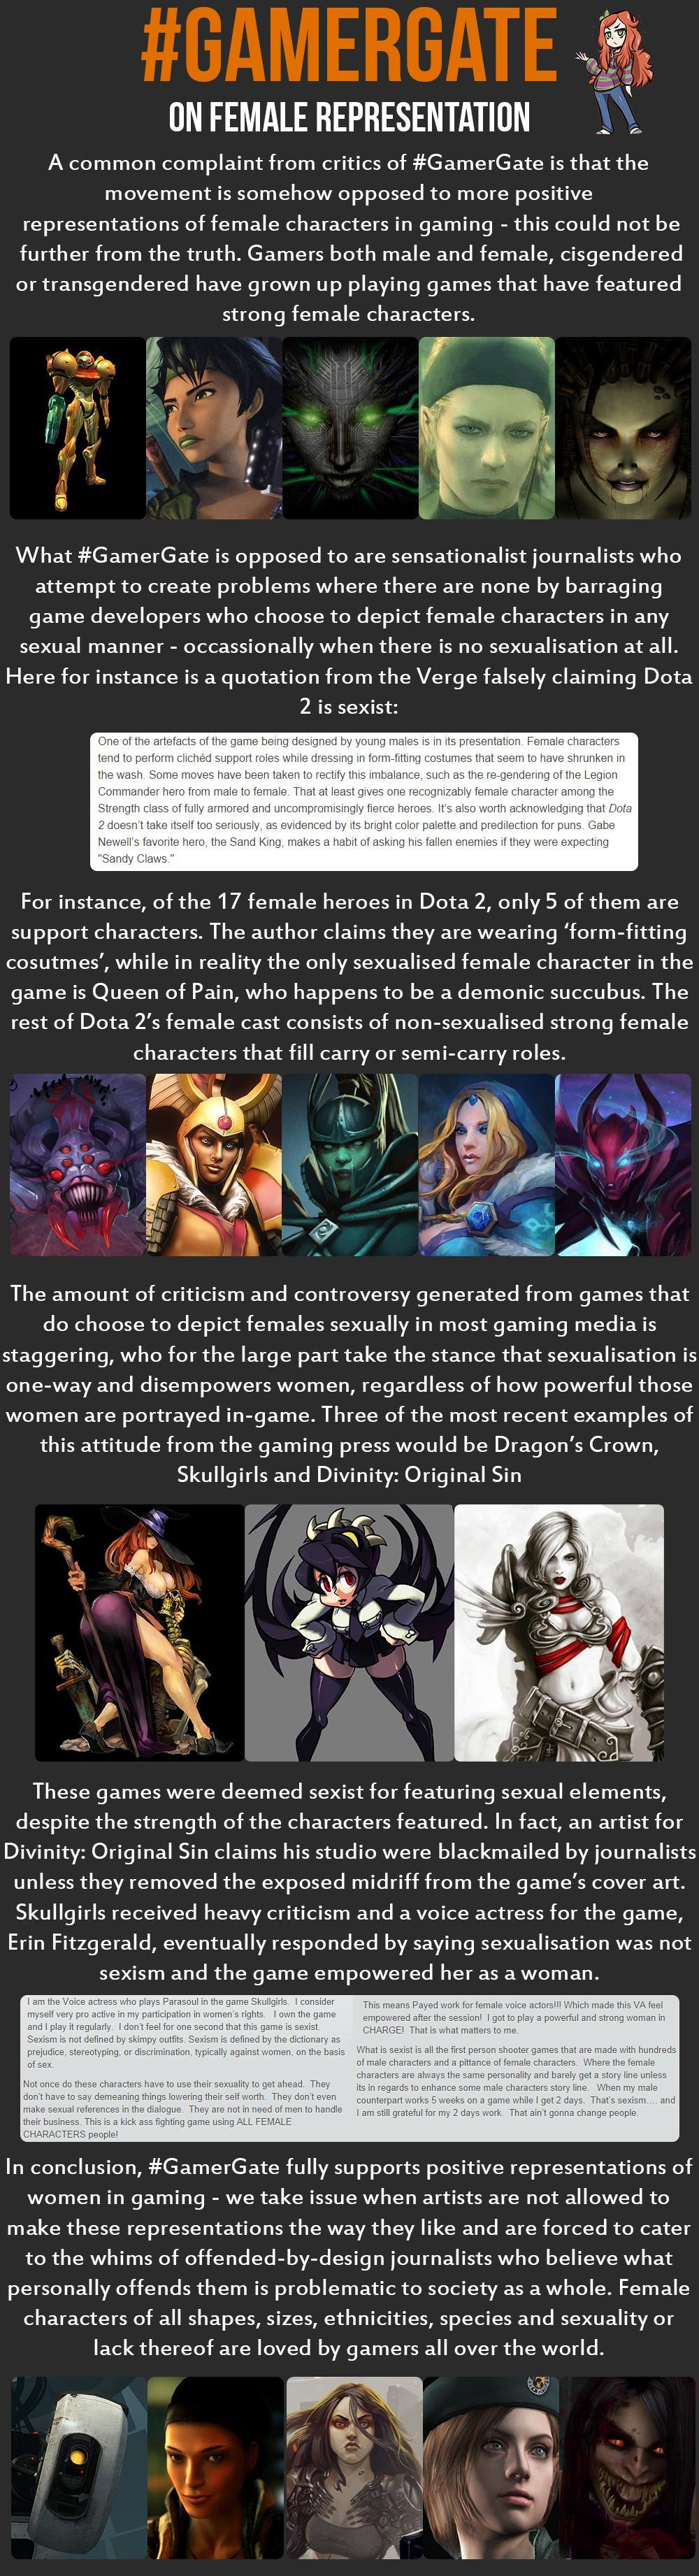 On female representation | GamerGate | Know Your Meme